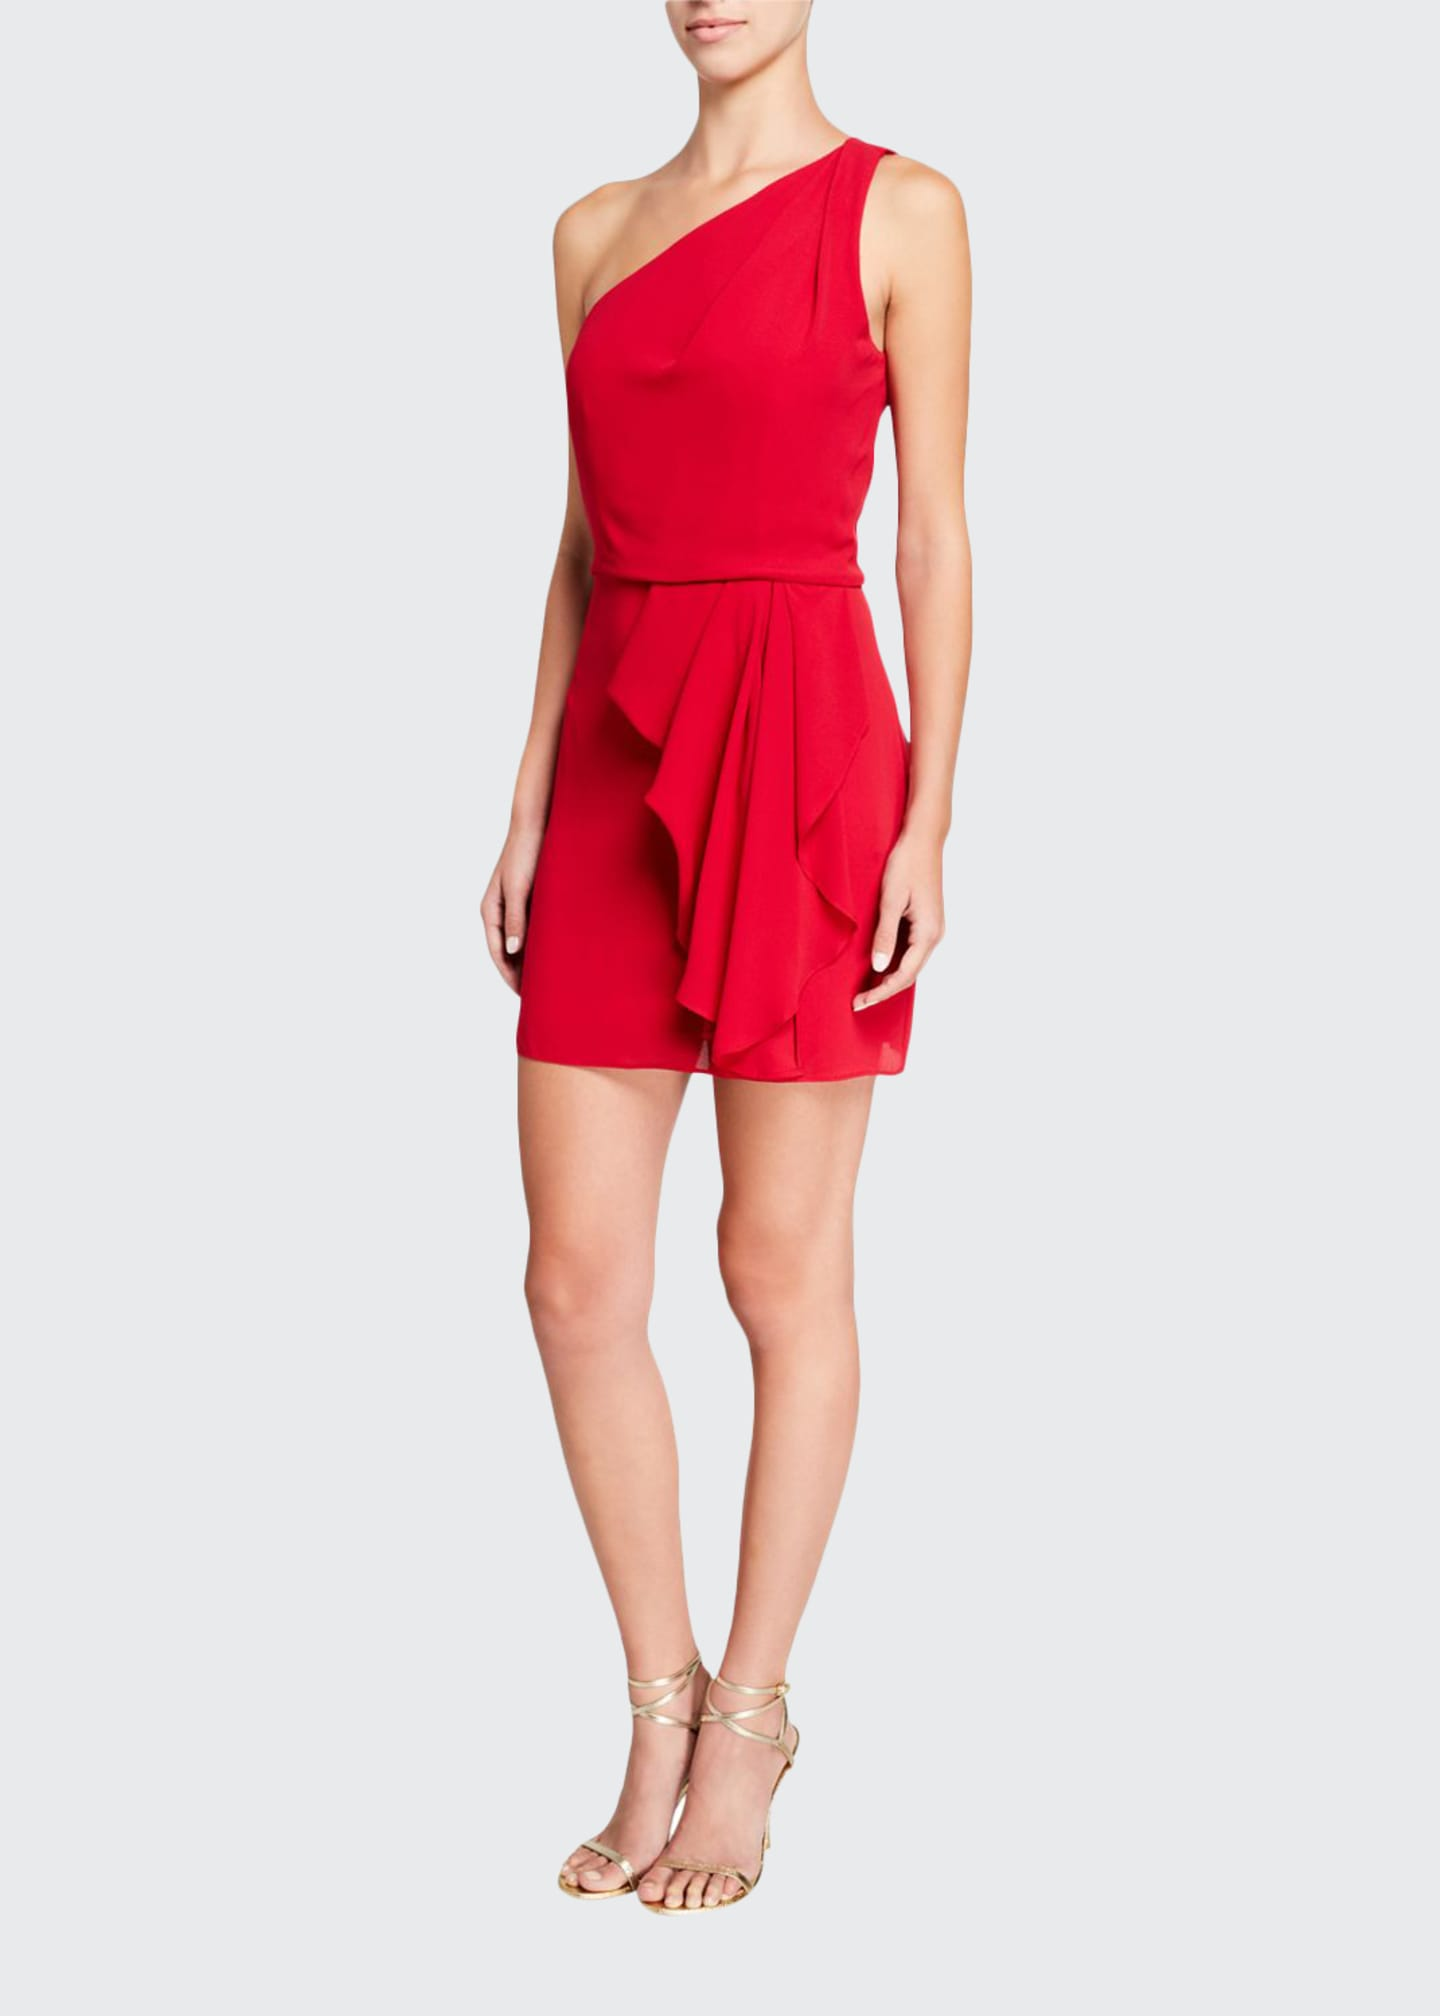 Halston One-Shoulder Drape-Front Dress